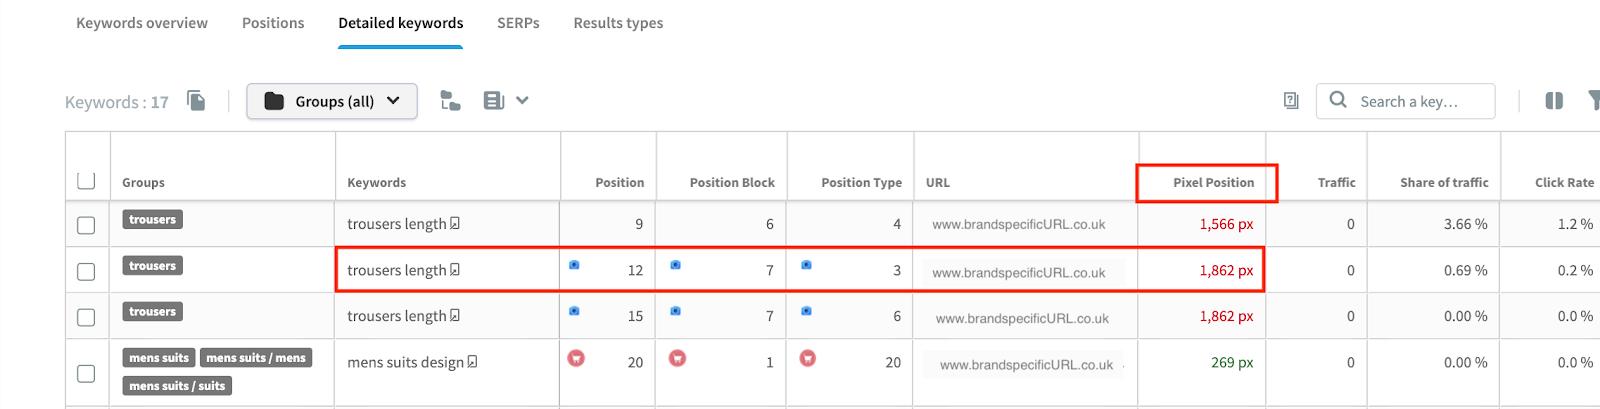 Pixel Ranking / Pixel Position